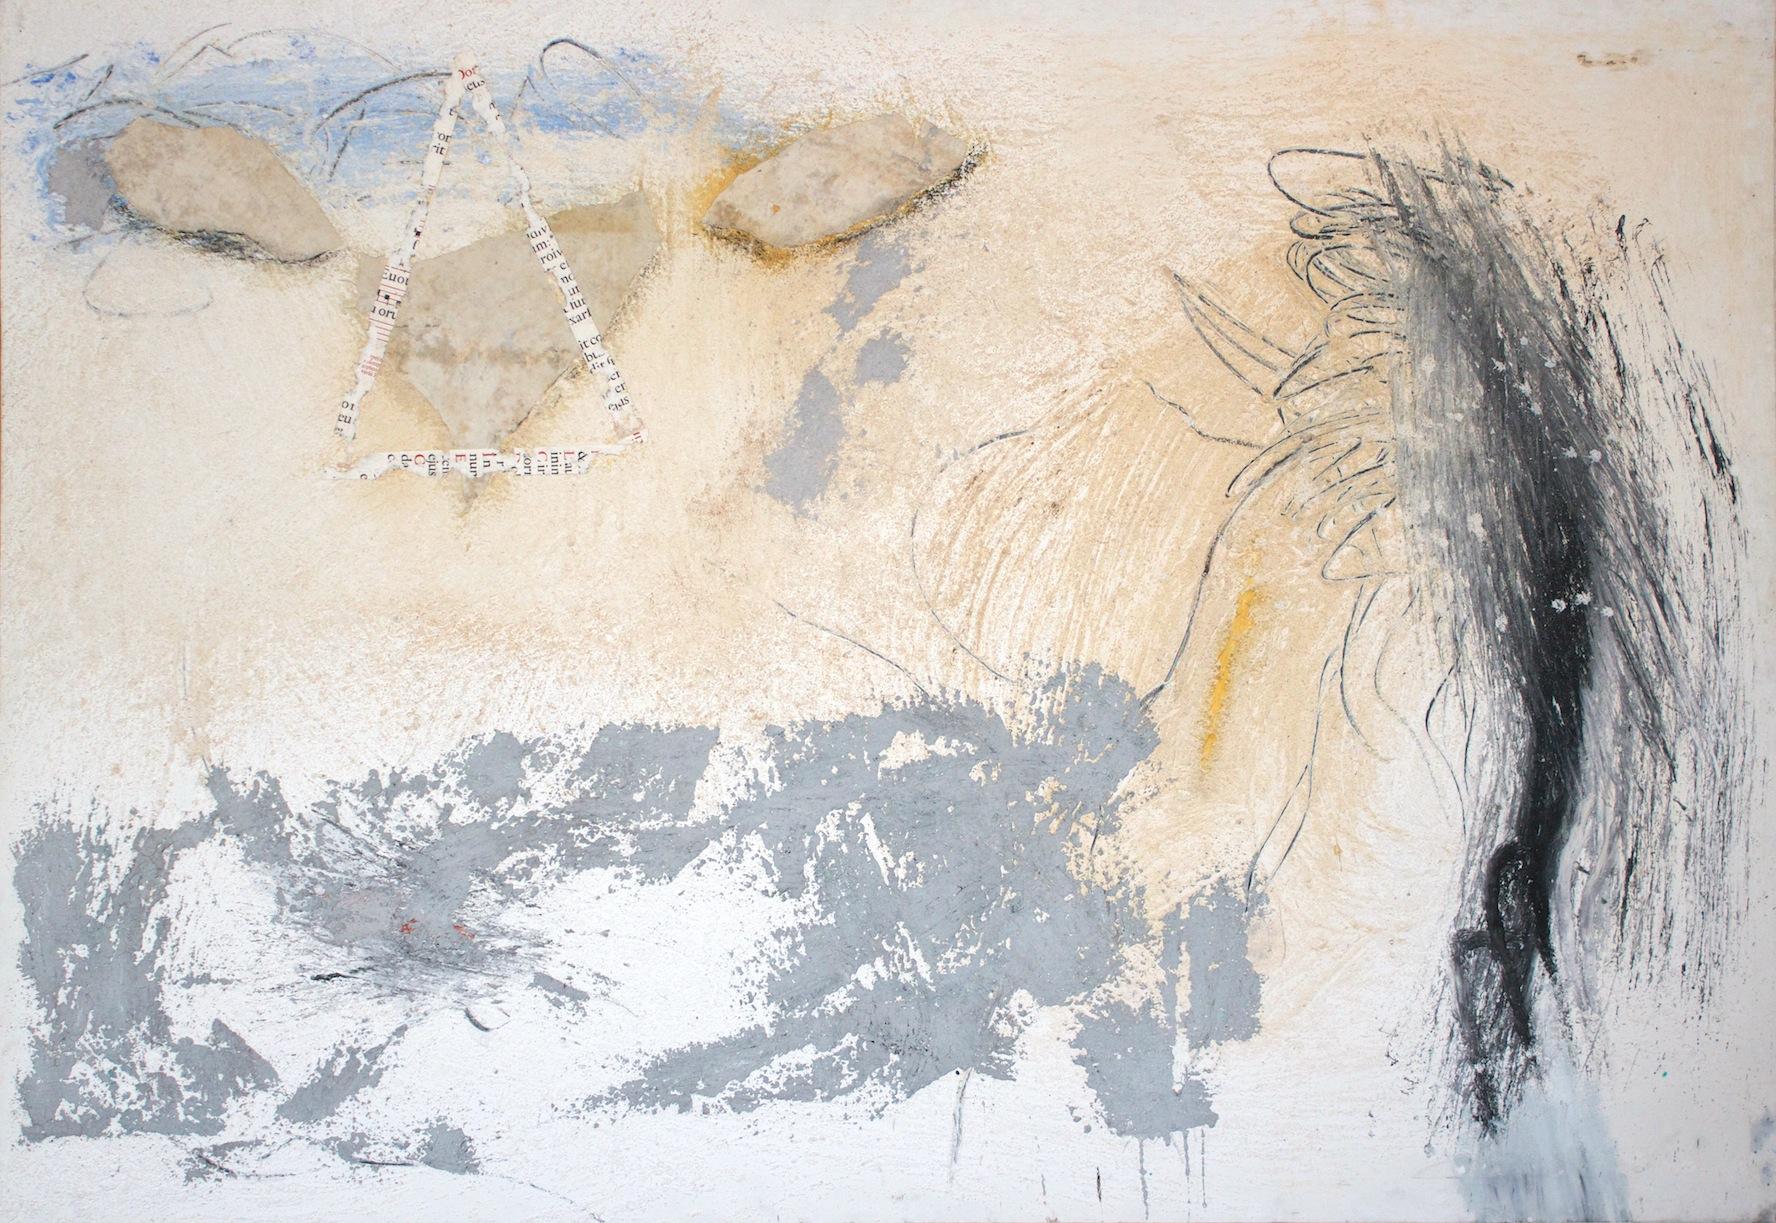 Marcello Mariani - Forma Archetipa - Oil, mixed media and collage on canvas - ca. 1990